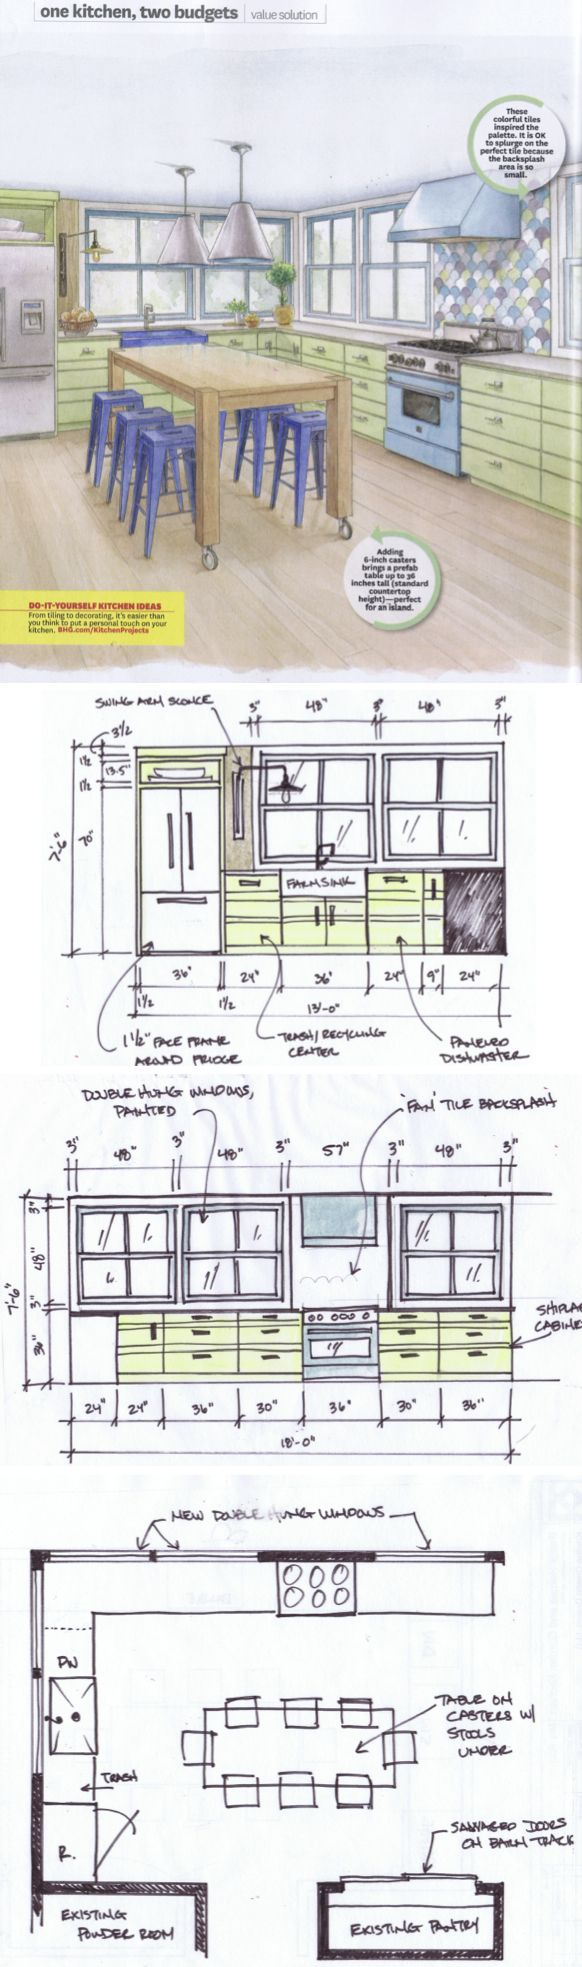 Kristina Crestin Design Sketch